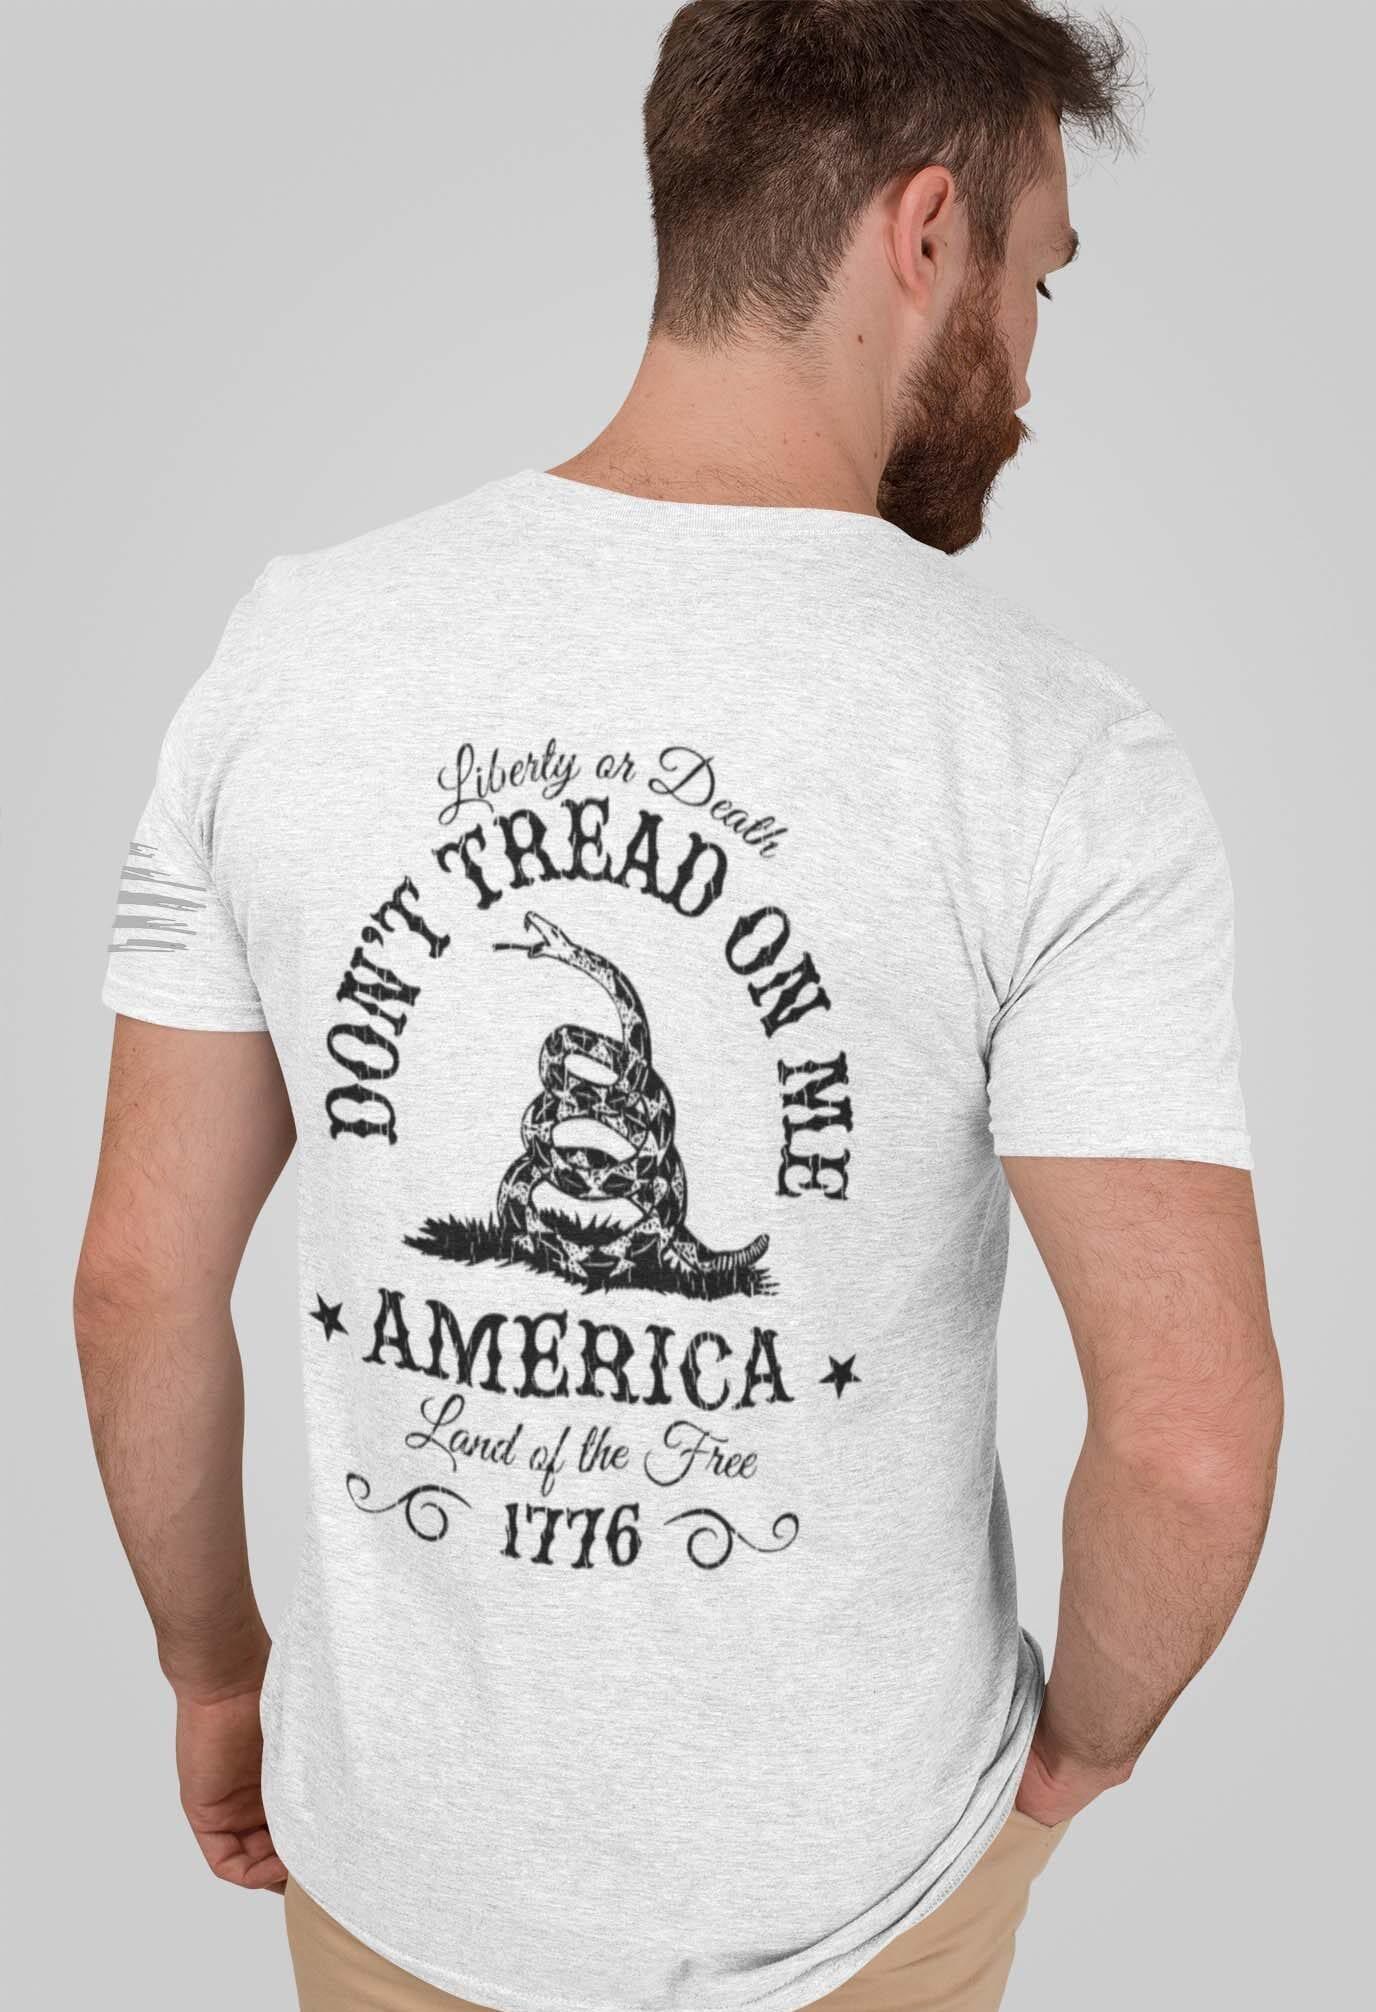 Don't tread on me in a Men's light heather grey men's t-shirt